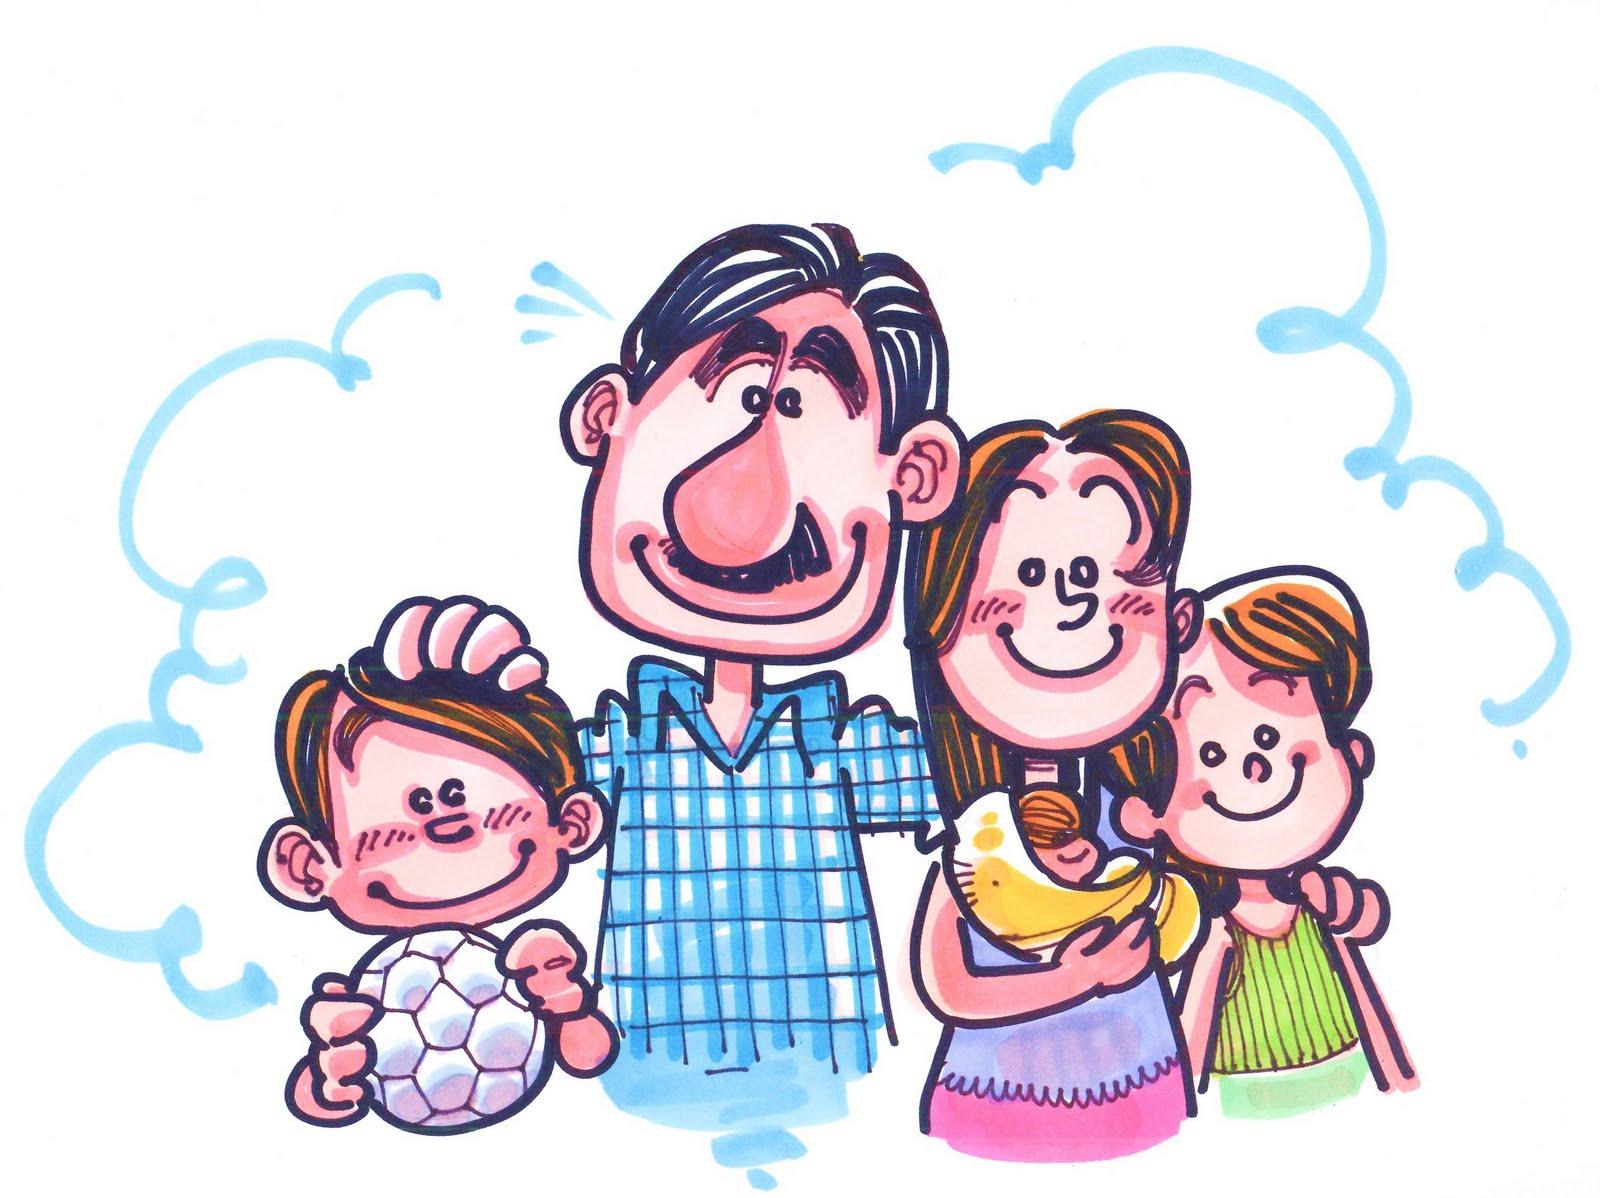 4 marzo 2007 dia familia: